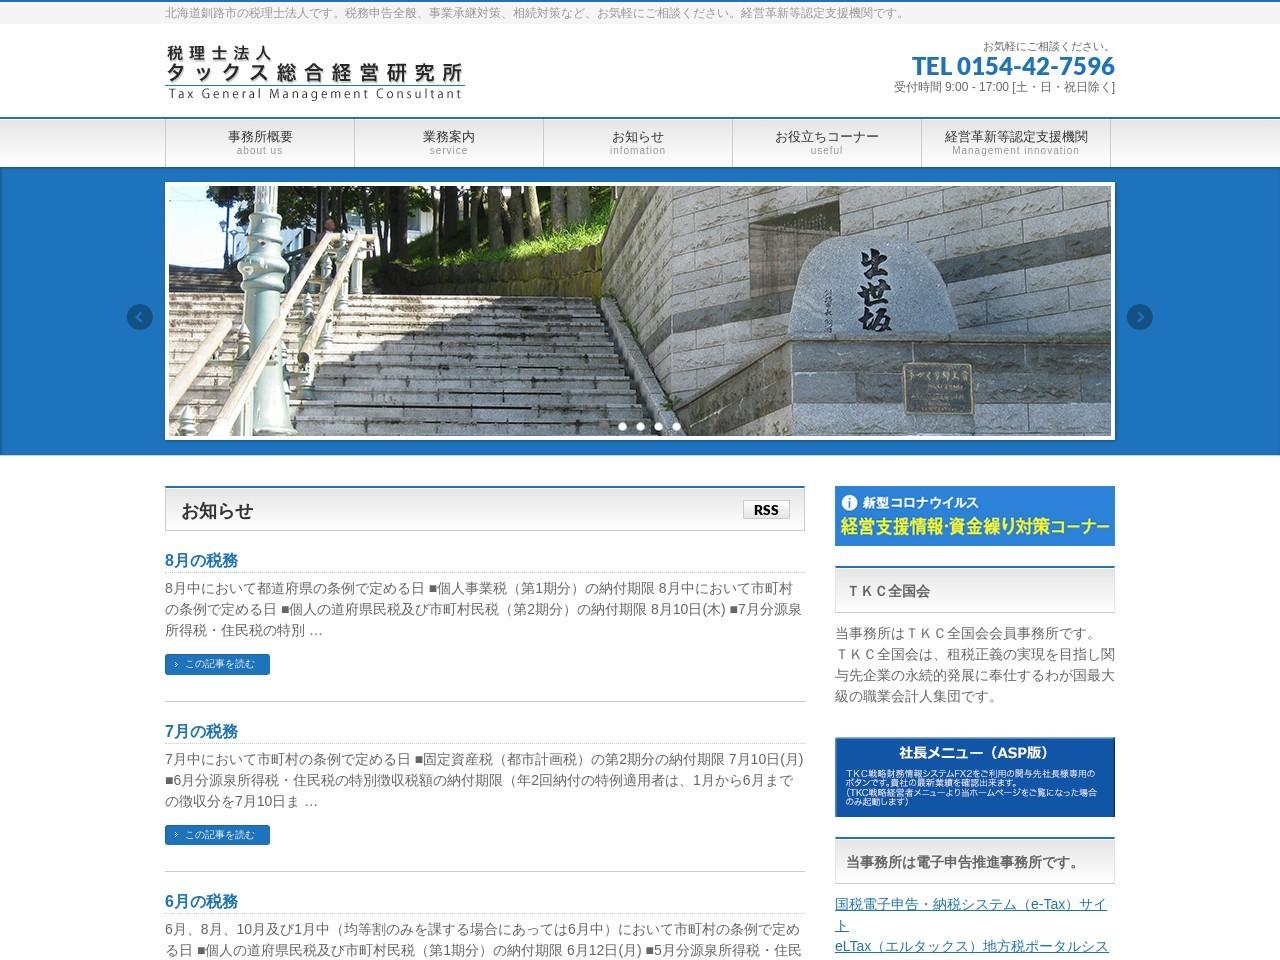 タックス総合経営研究所(税理士法人)